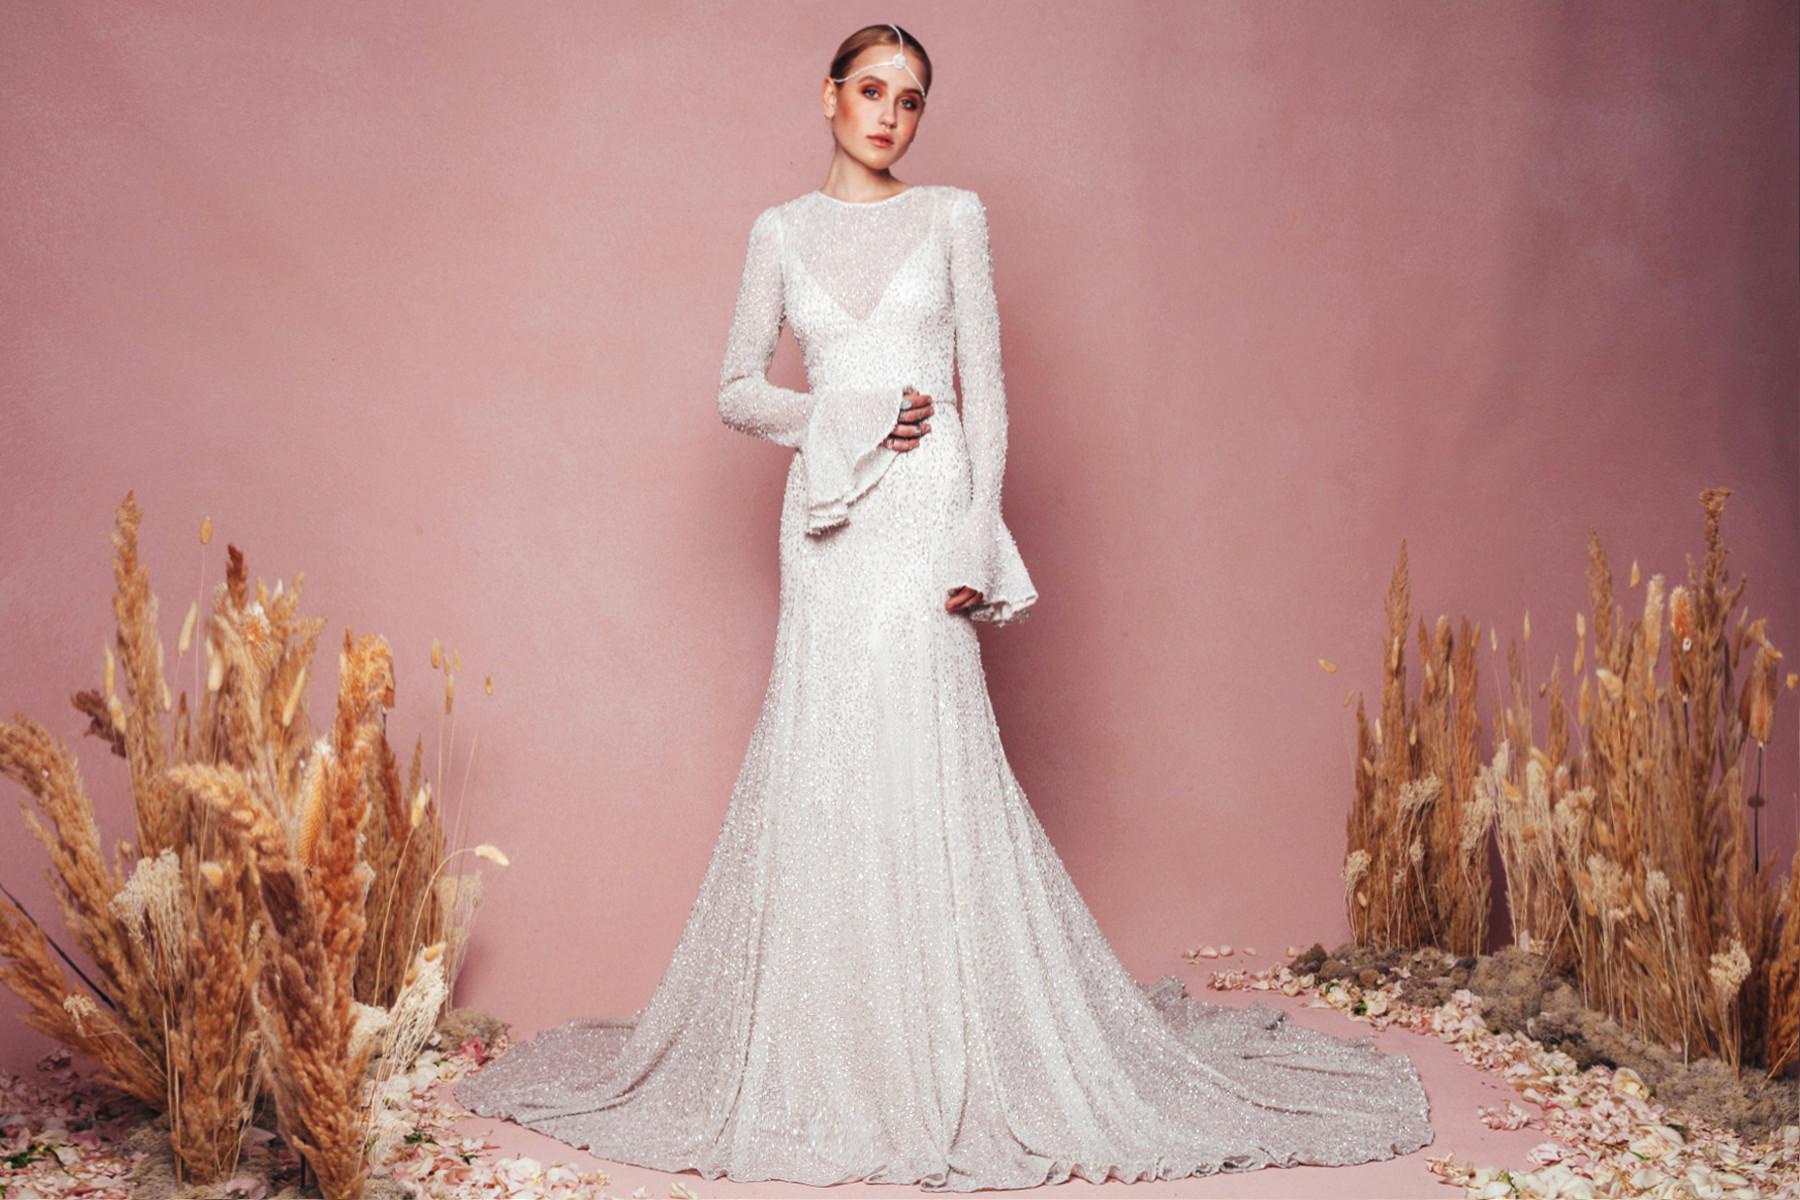 BRIDE // Wedding Dresses Under $10,000 — Love Find Co.